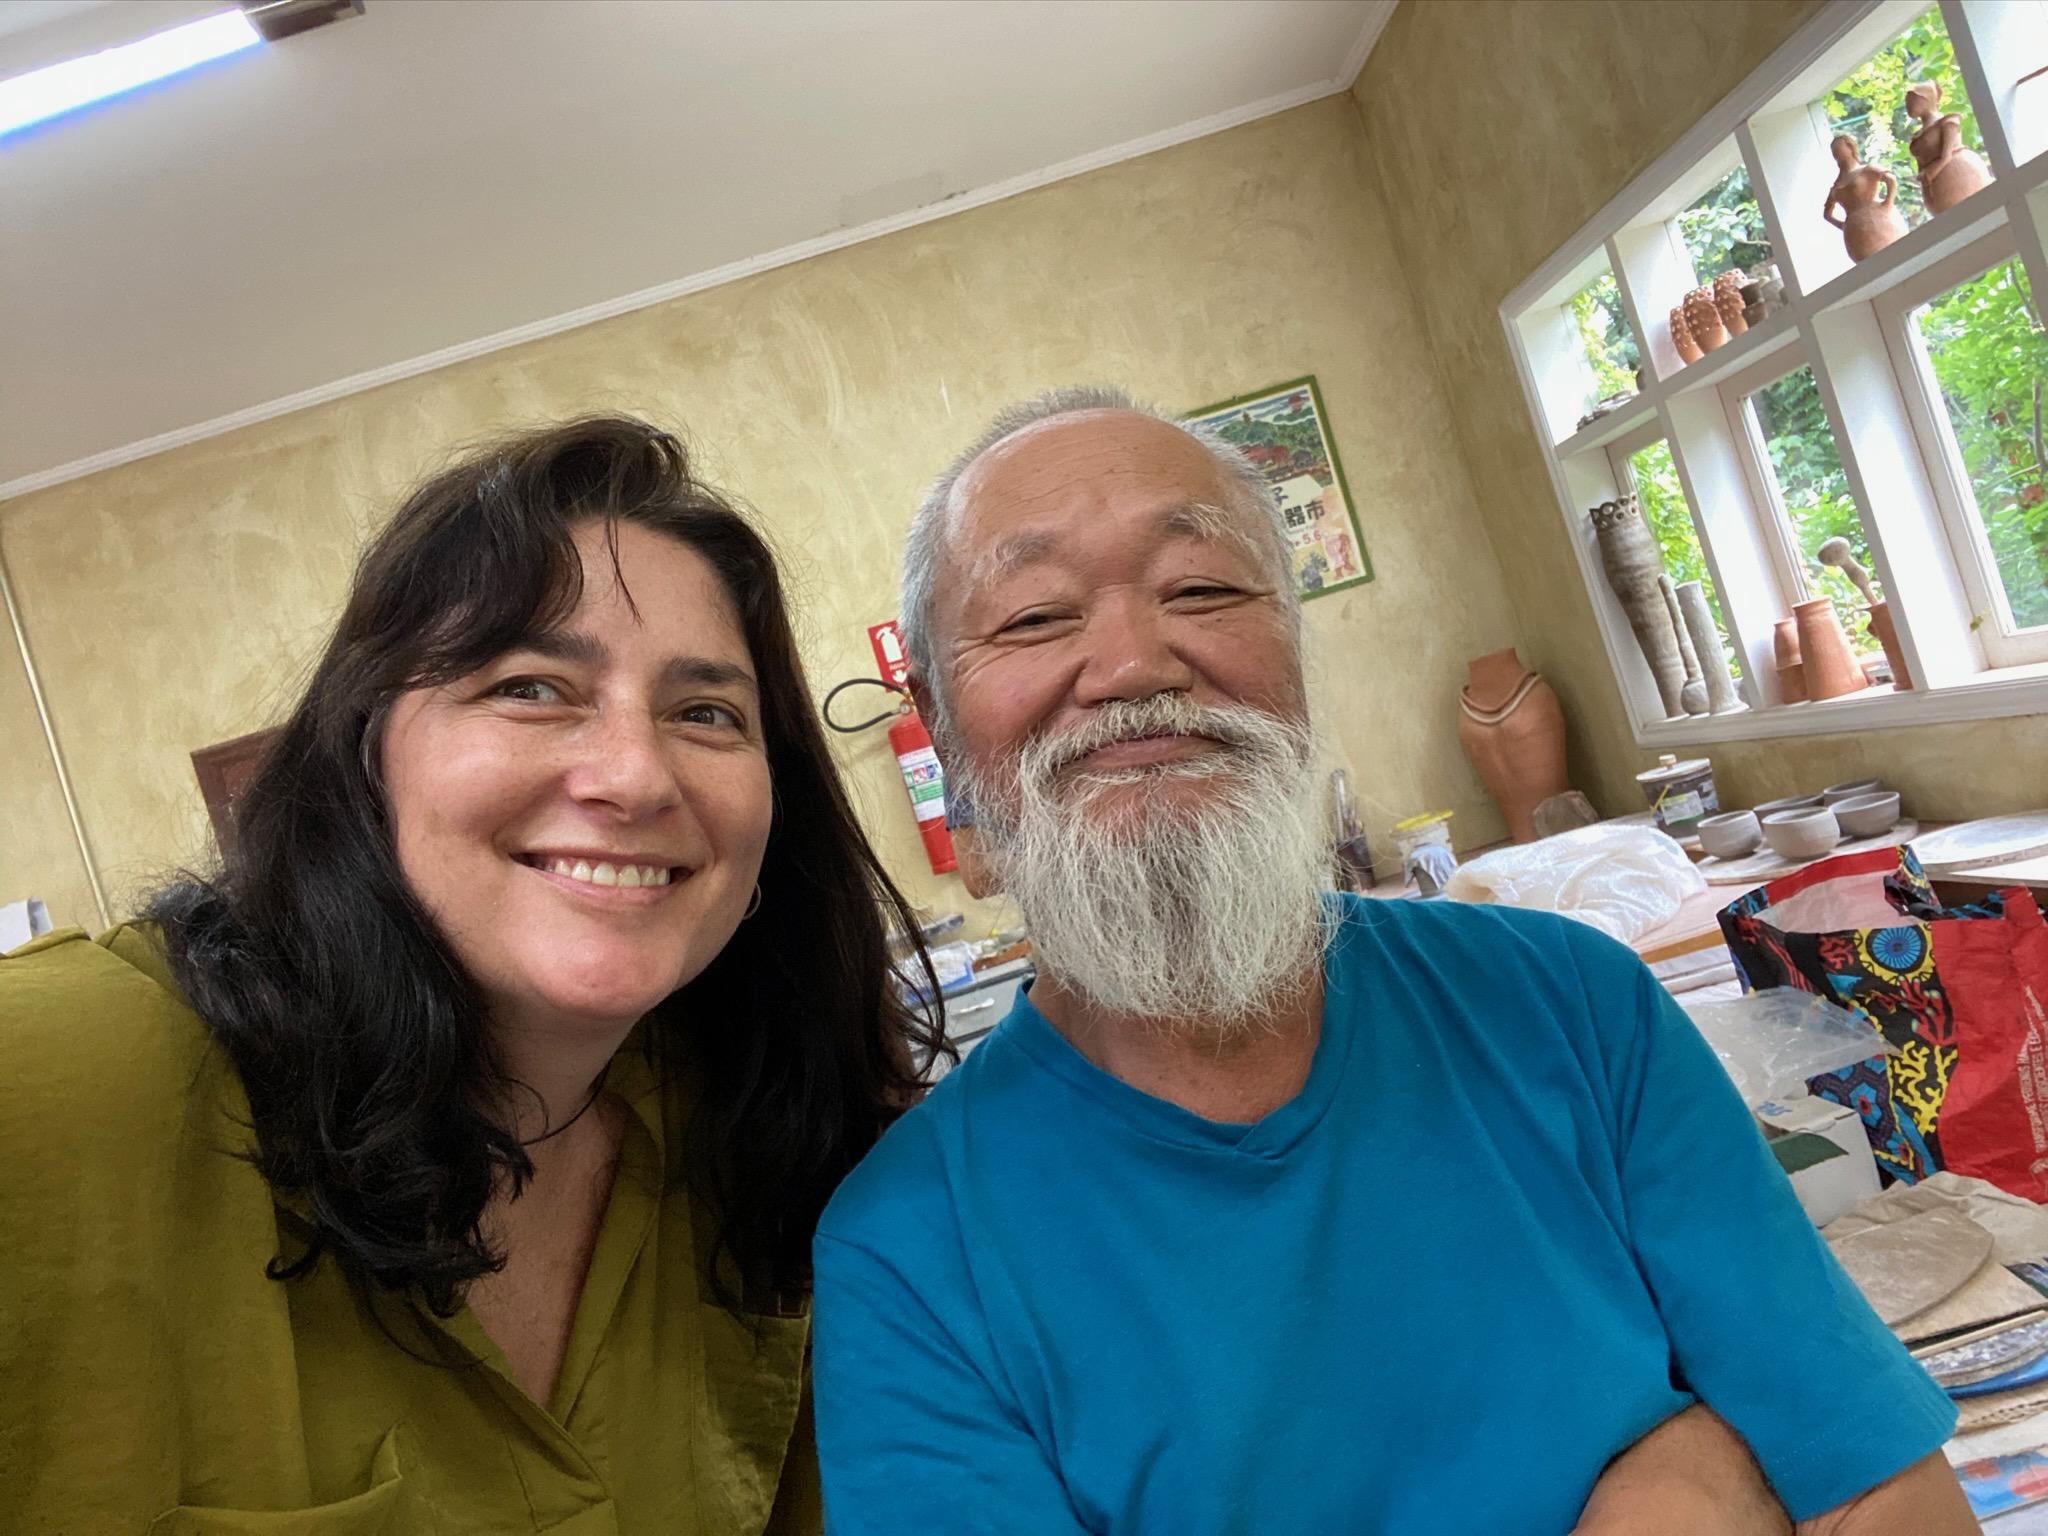 intercambio Brasil Japão, com sensei Ikoma no atelie de Silmara Watari